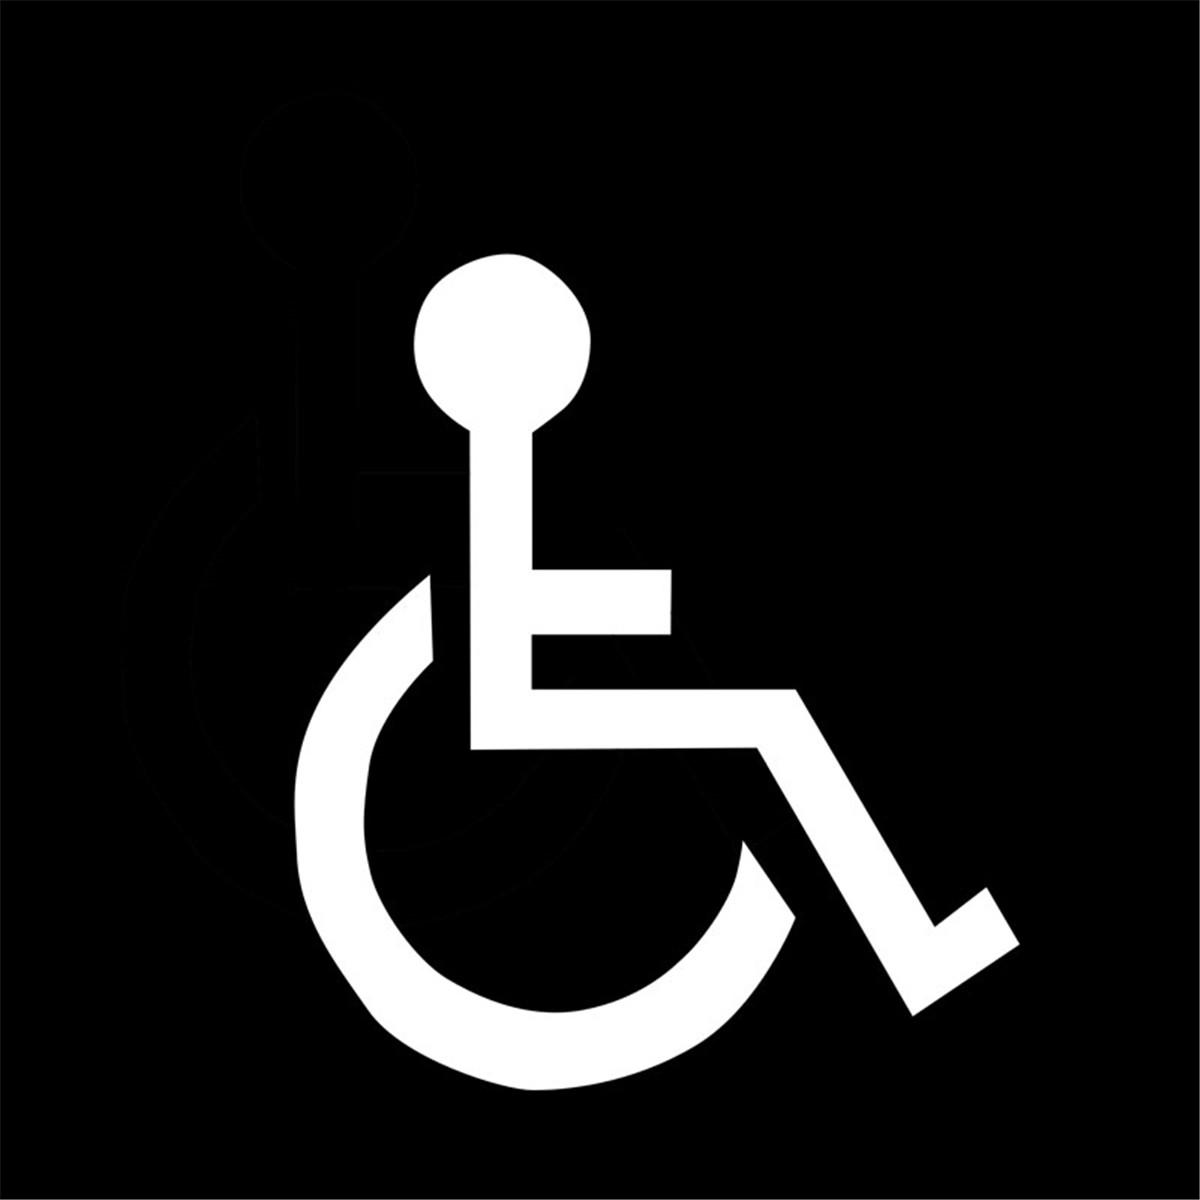 Handicap Parking Space Decal Wheelchair Disabled vinyl sticker outdoor sign